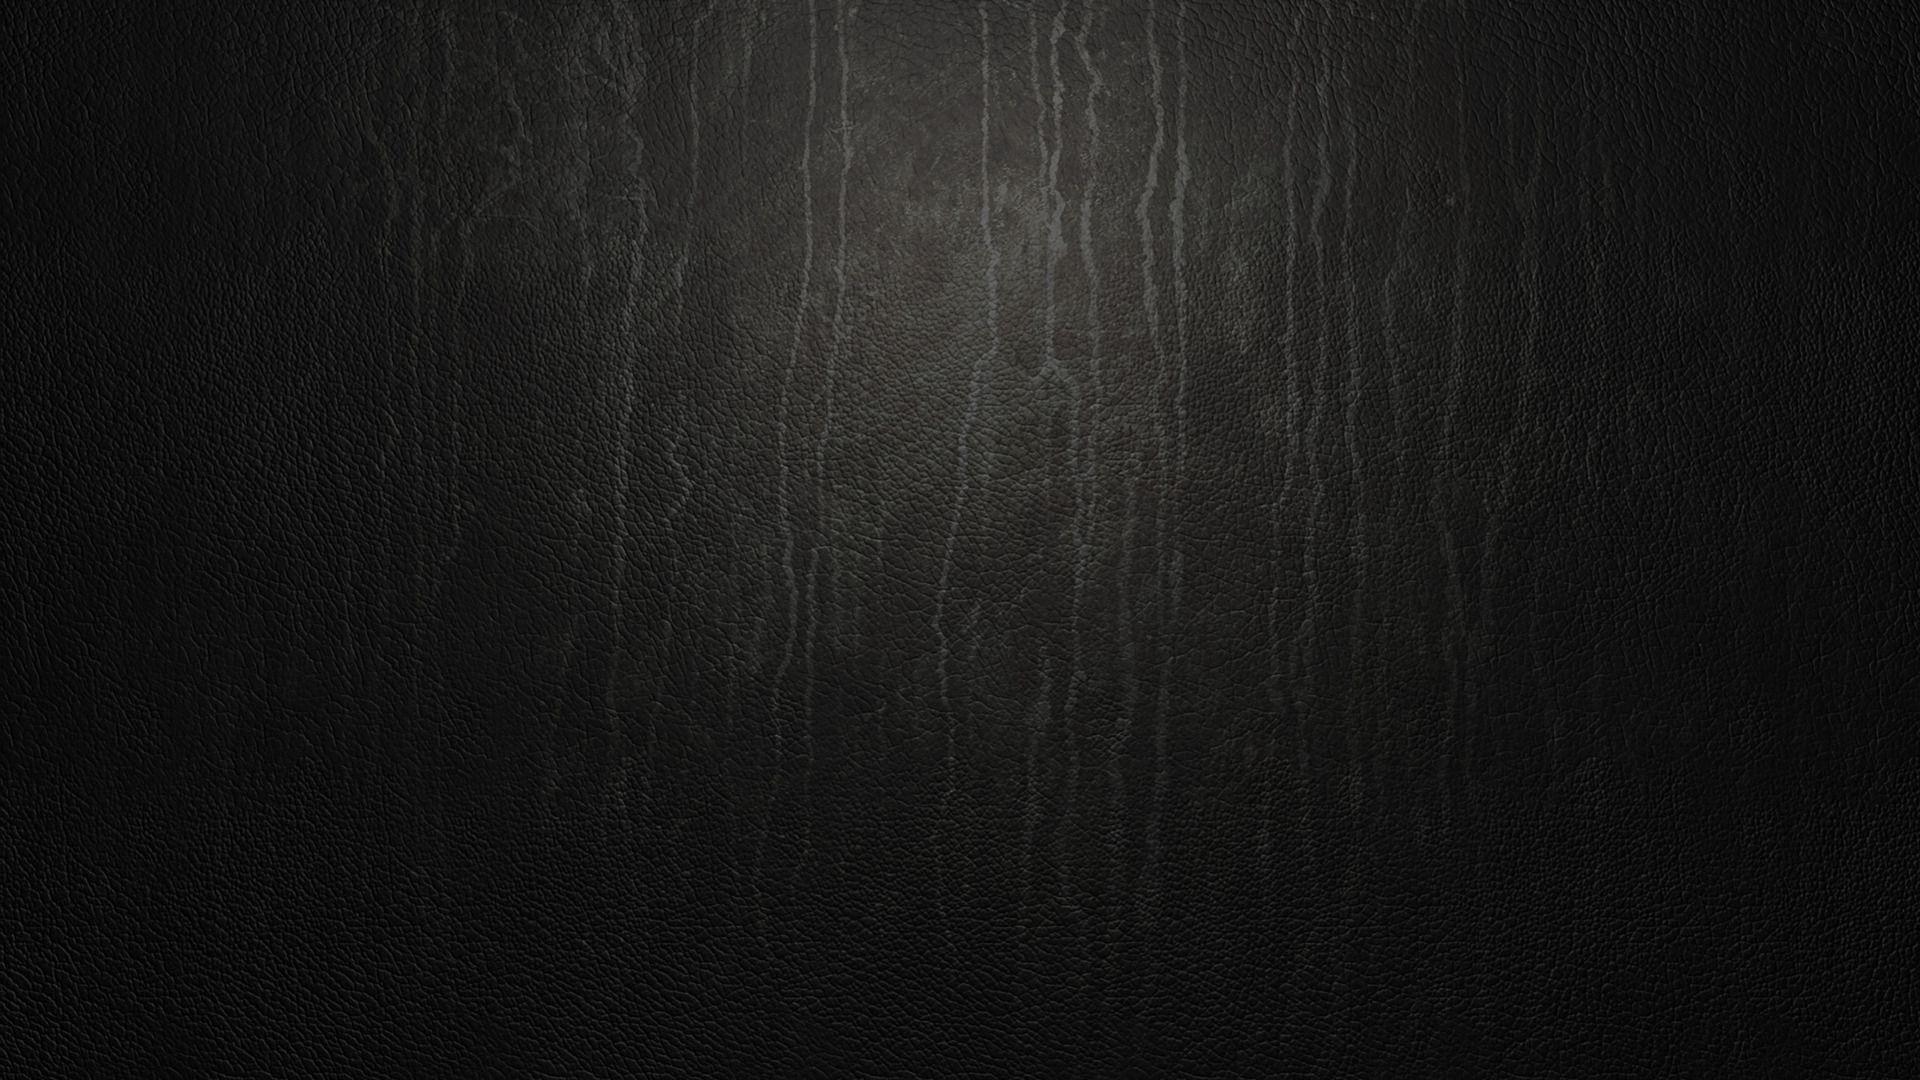 Black Texture Wallpaper 19x1080 Wallpaper 2 Jpg 19 1080 壁紙 色